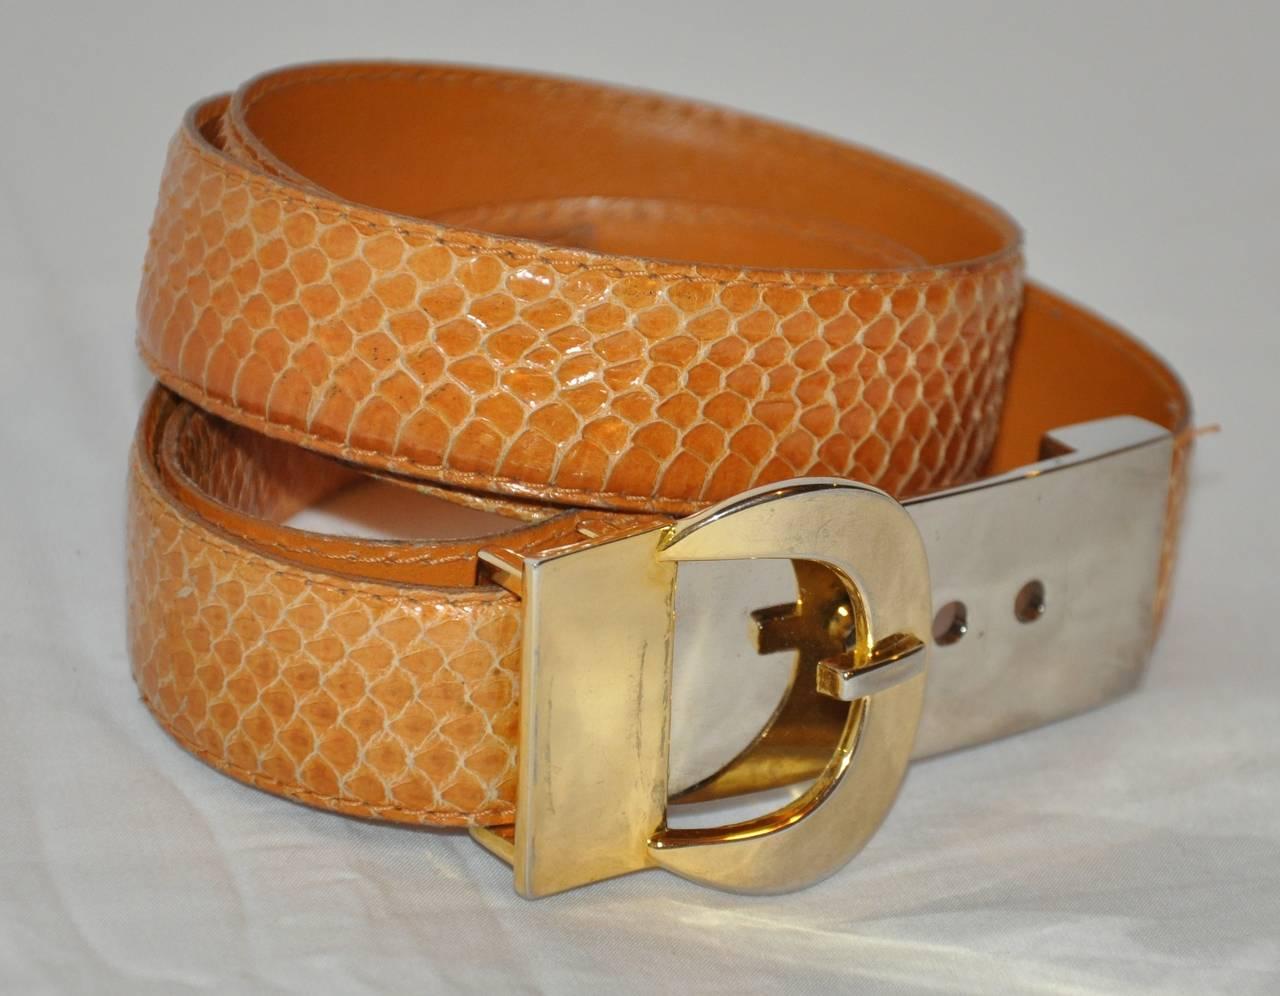 Christian Dior Mustard Yellow Snakeskin with Gold Hardware Adjustable Belt 2